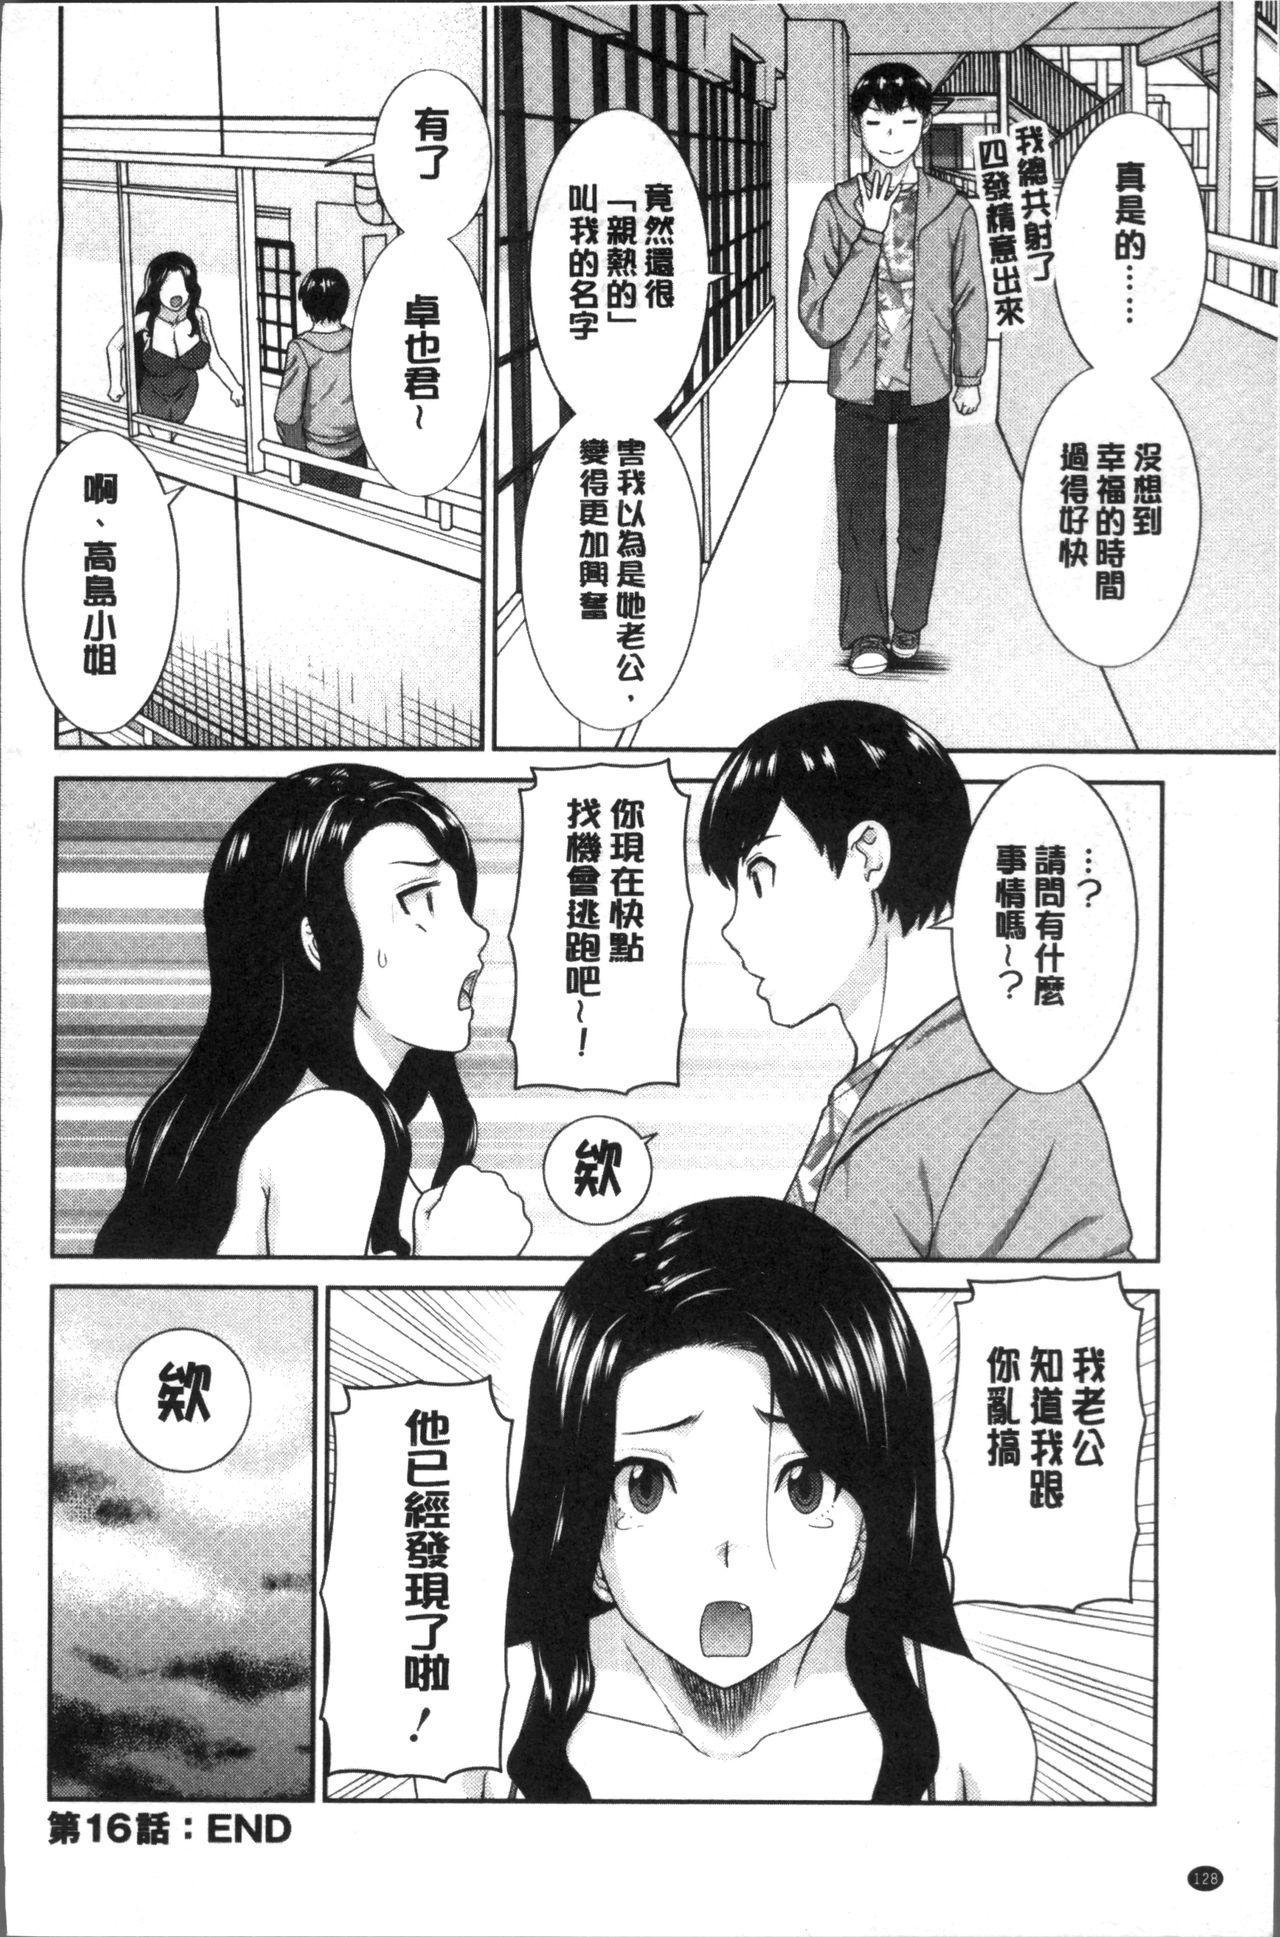 [Kawamori Misaki] Innyuu Shufu no Futei Ganbou - Oku-san to Kanojo to 2 | 淫乳主婦的不貞願望 和人妻也和女友❤2 [Chinese] 131